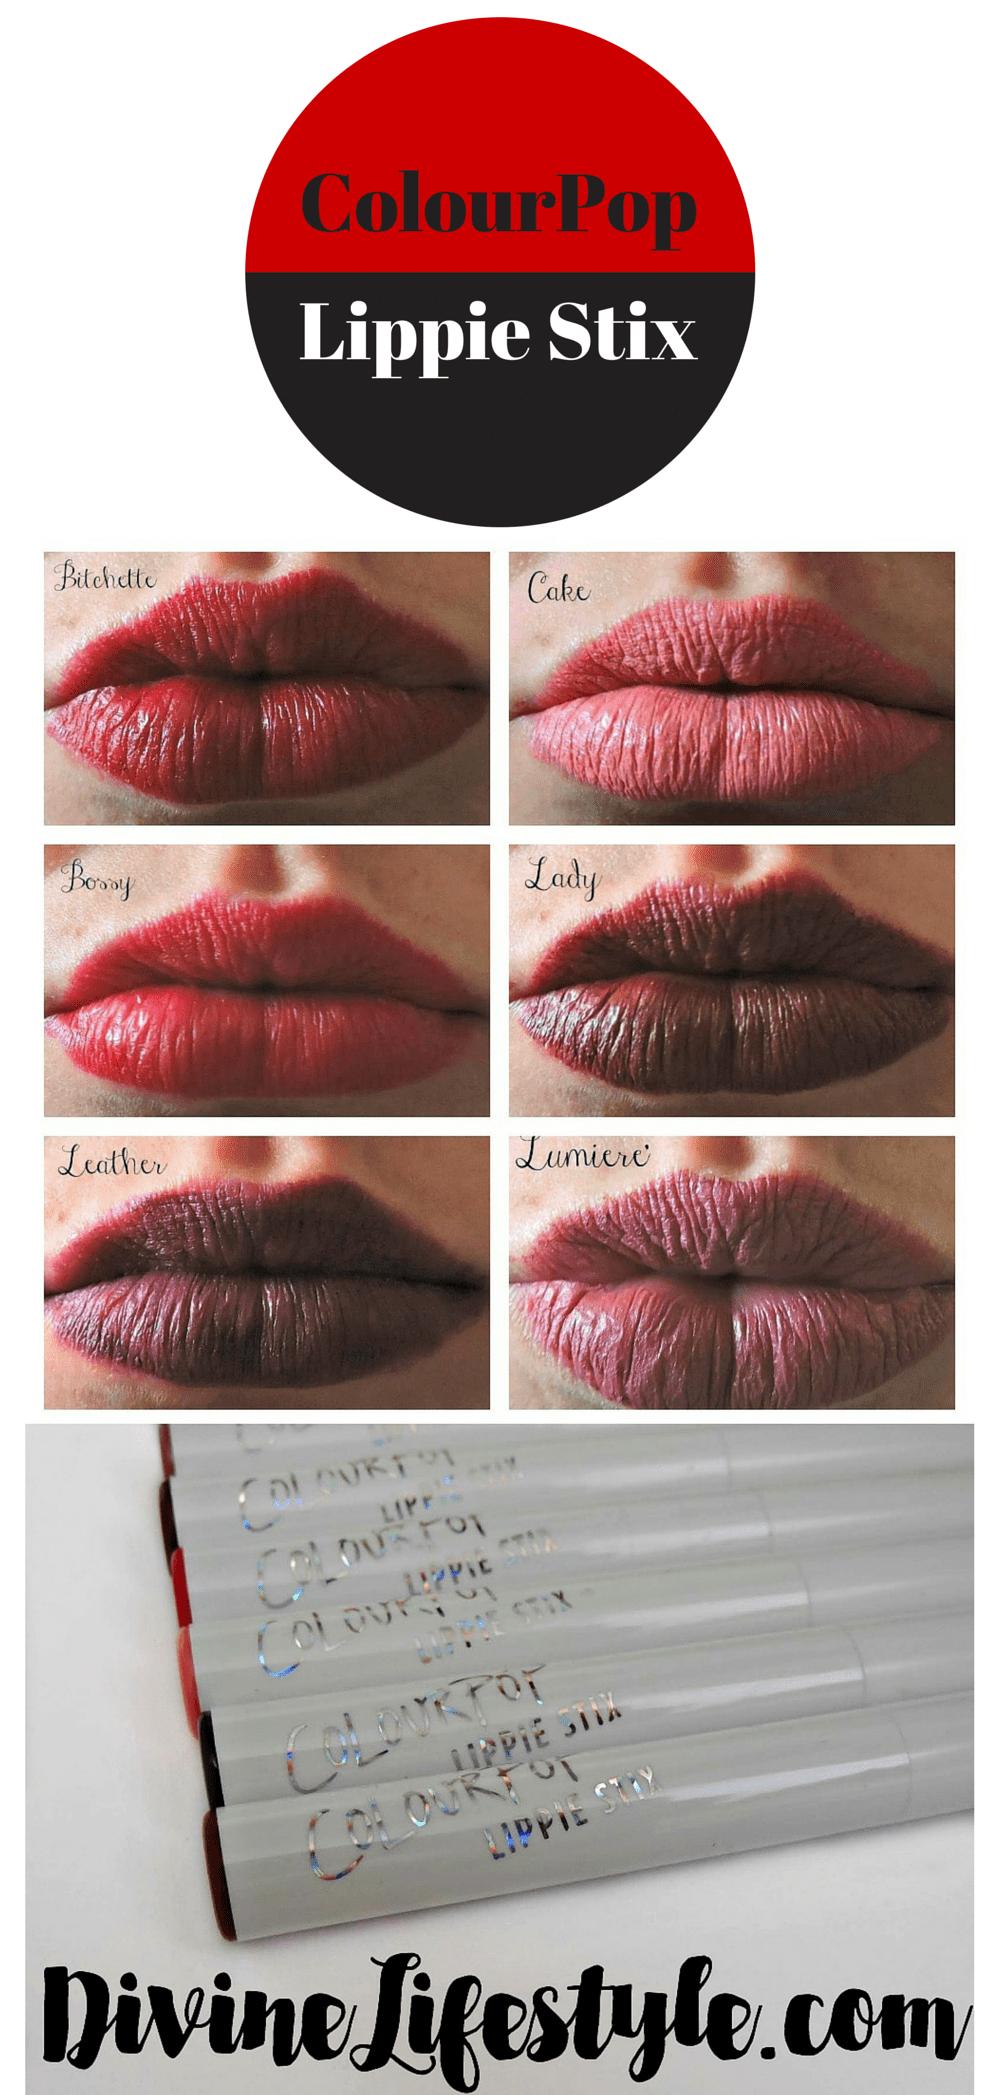 ColourPop Lippie Stix Lipstick Review